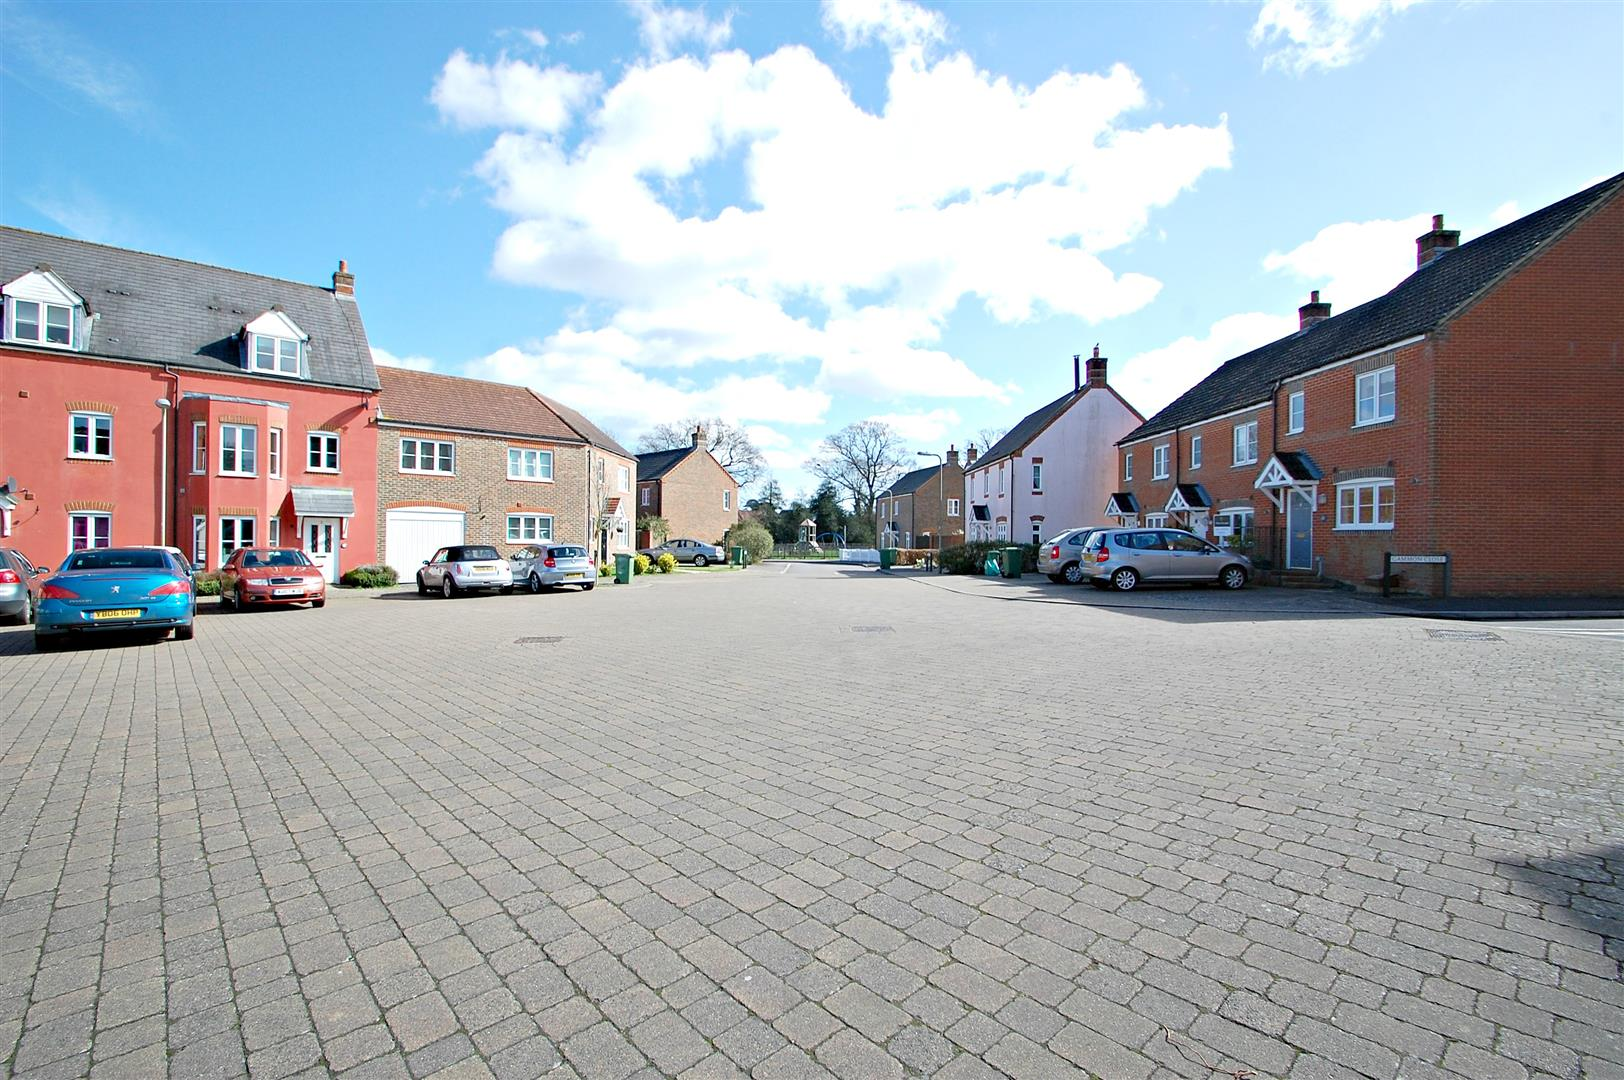 Hobbs Square, Hampshire